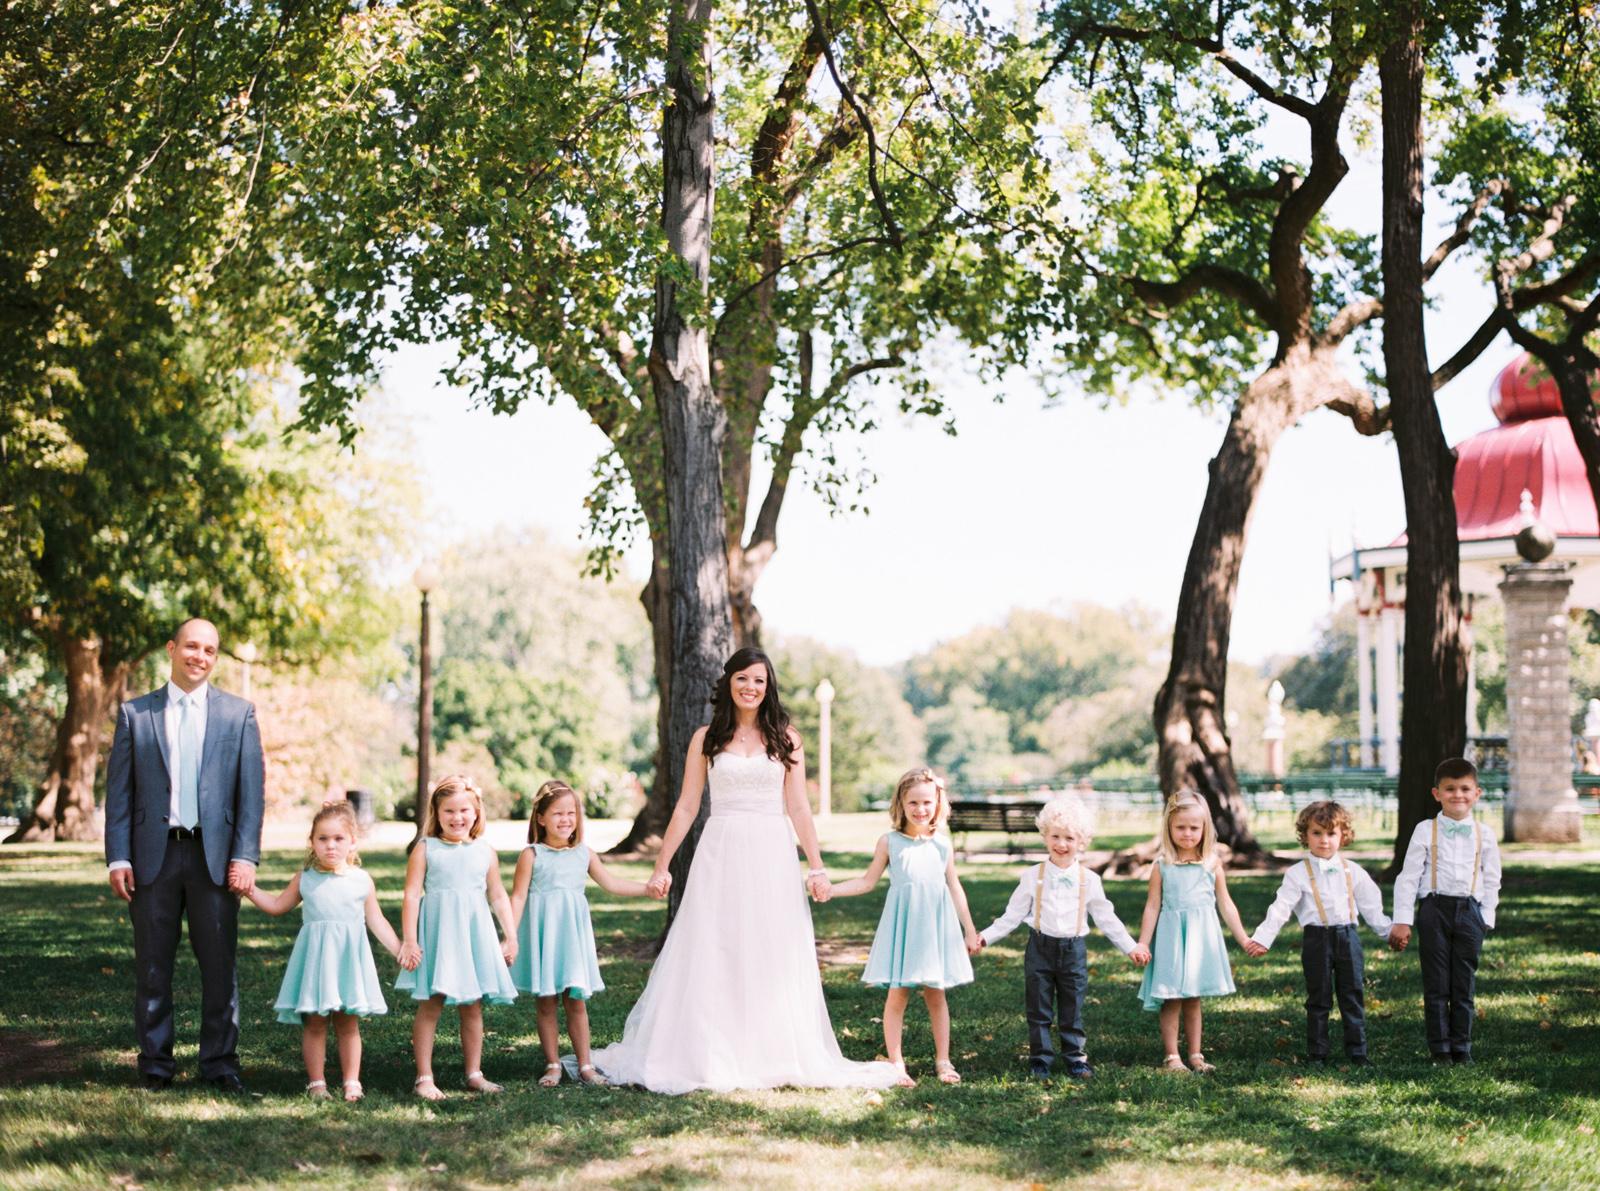 Oldani-Photography-St-Louis-Film-Photographer-Tower-Grove-Park-Wedding-Photographer-Music-Stand-8604_13.jpg